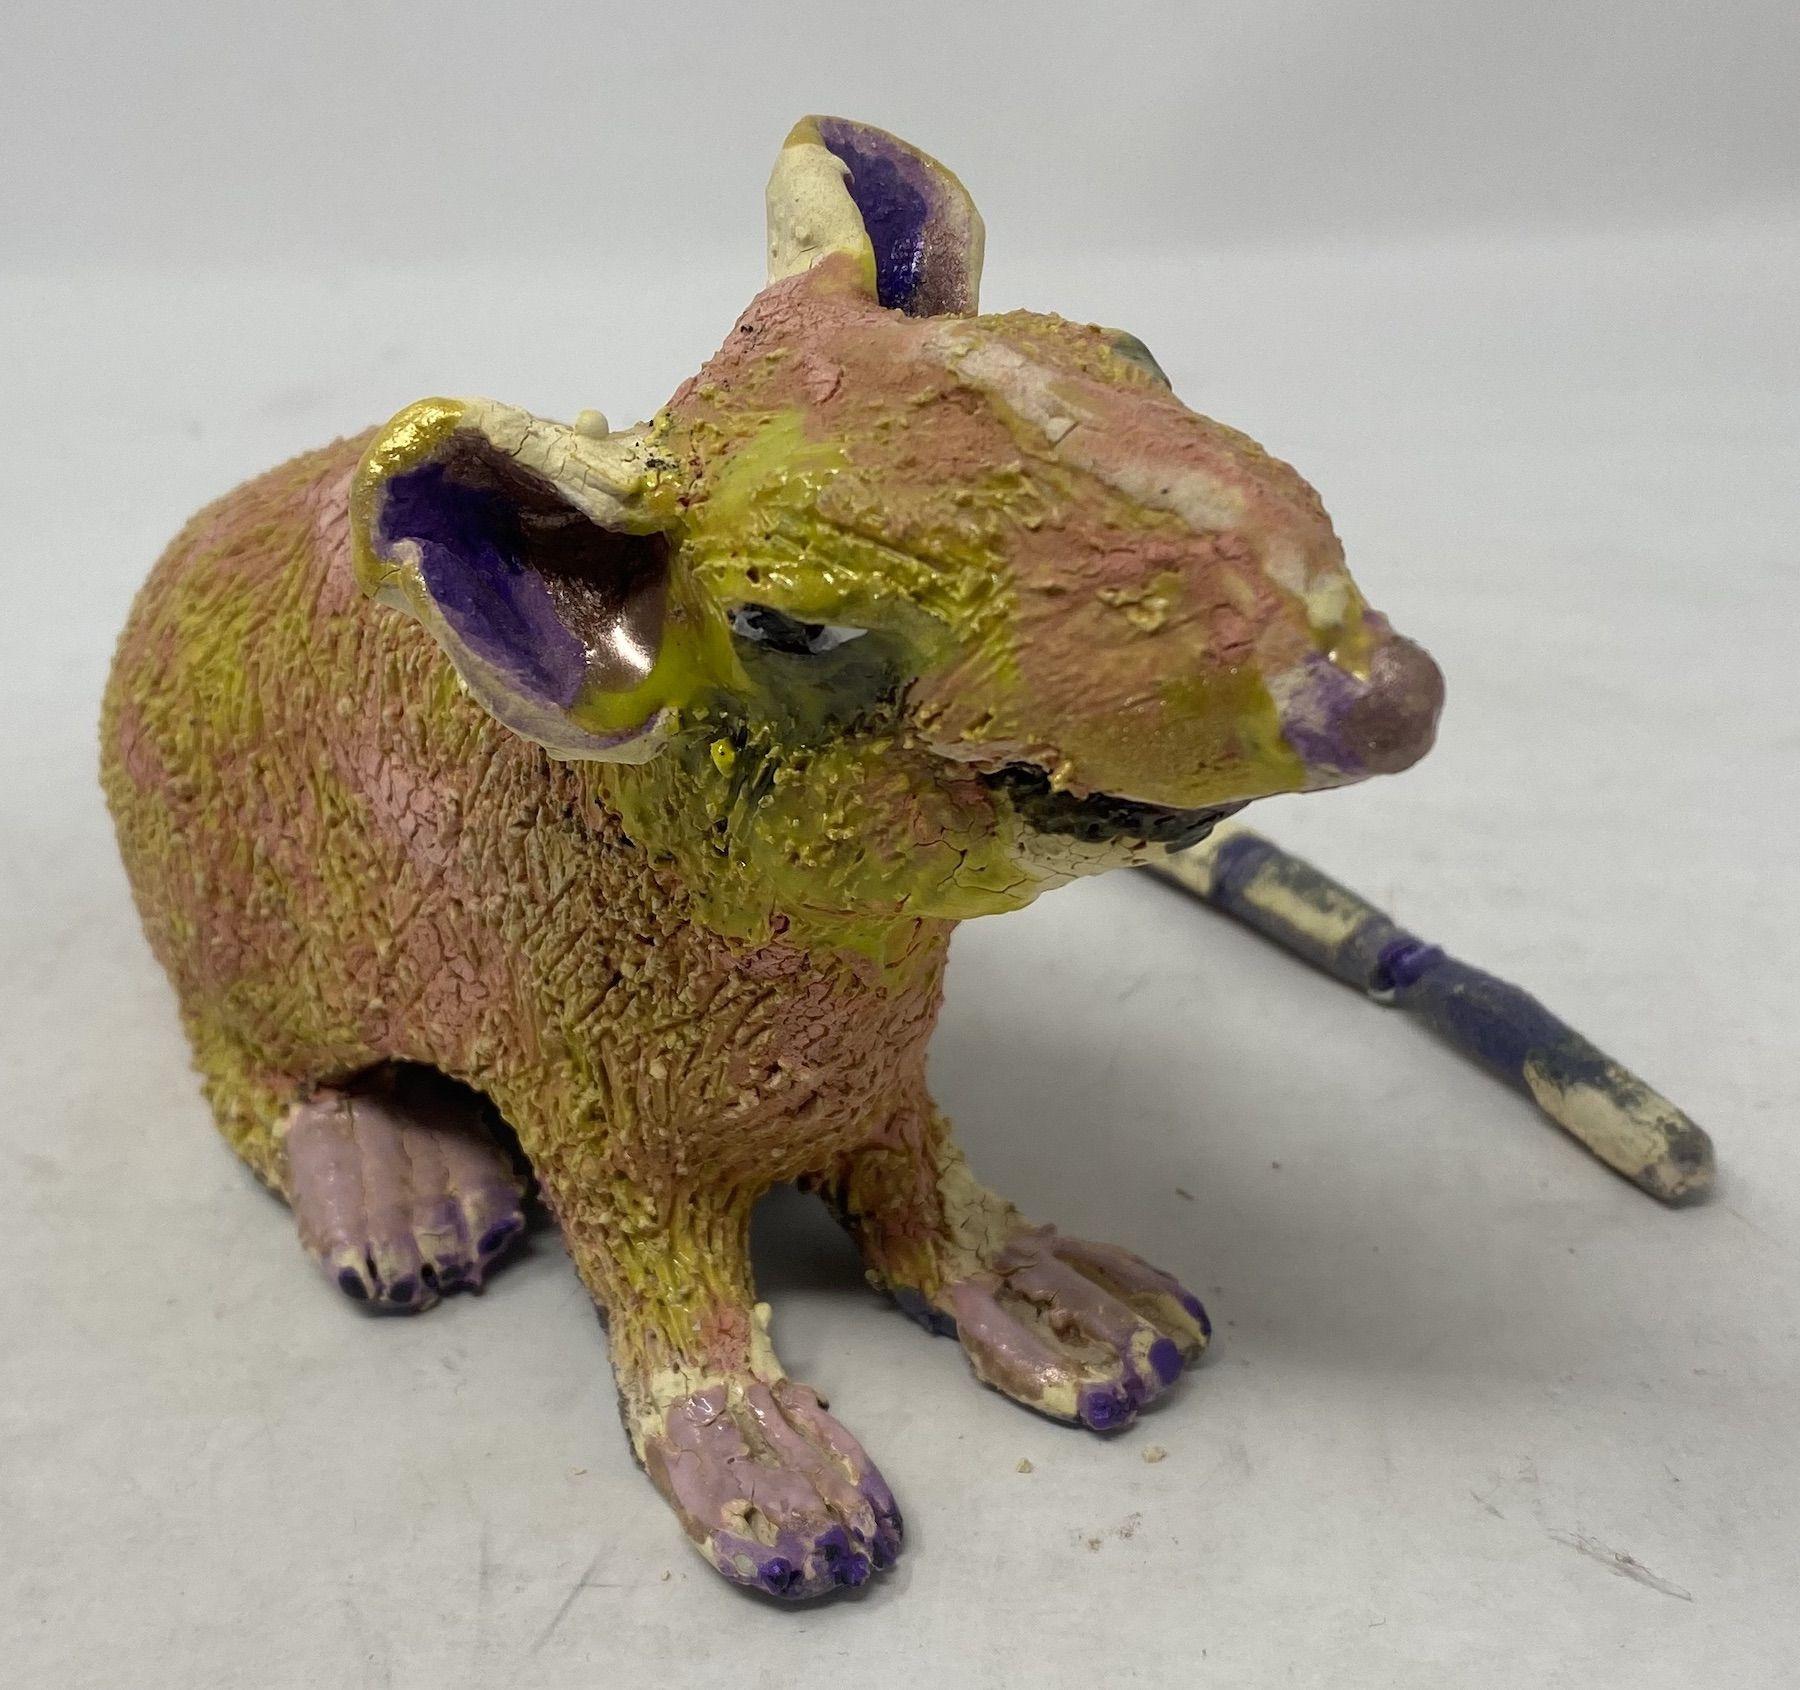 JENNY DAY, Dandelion Rat, 2021